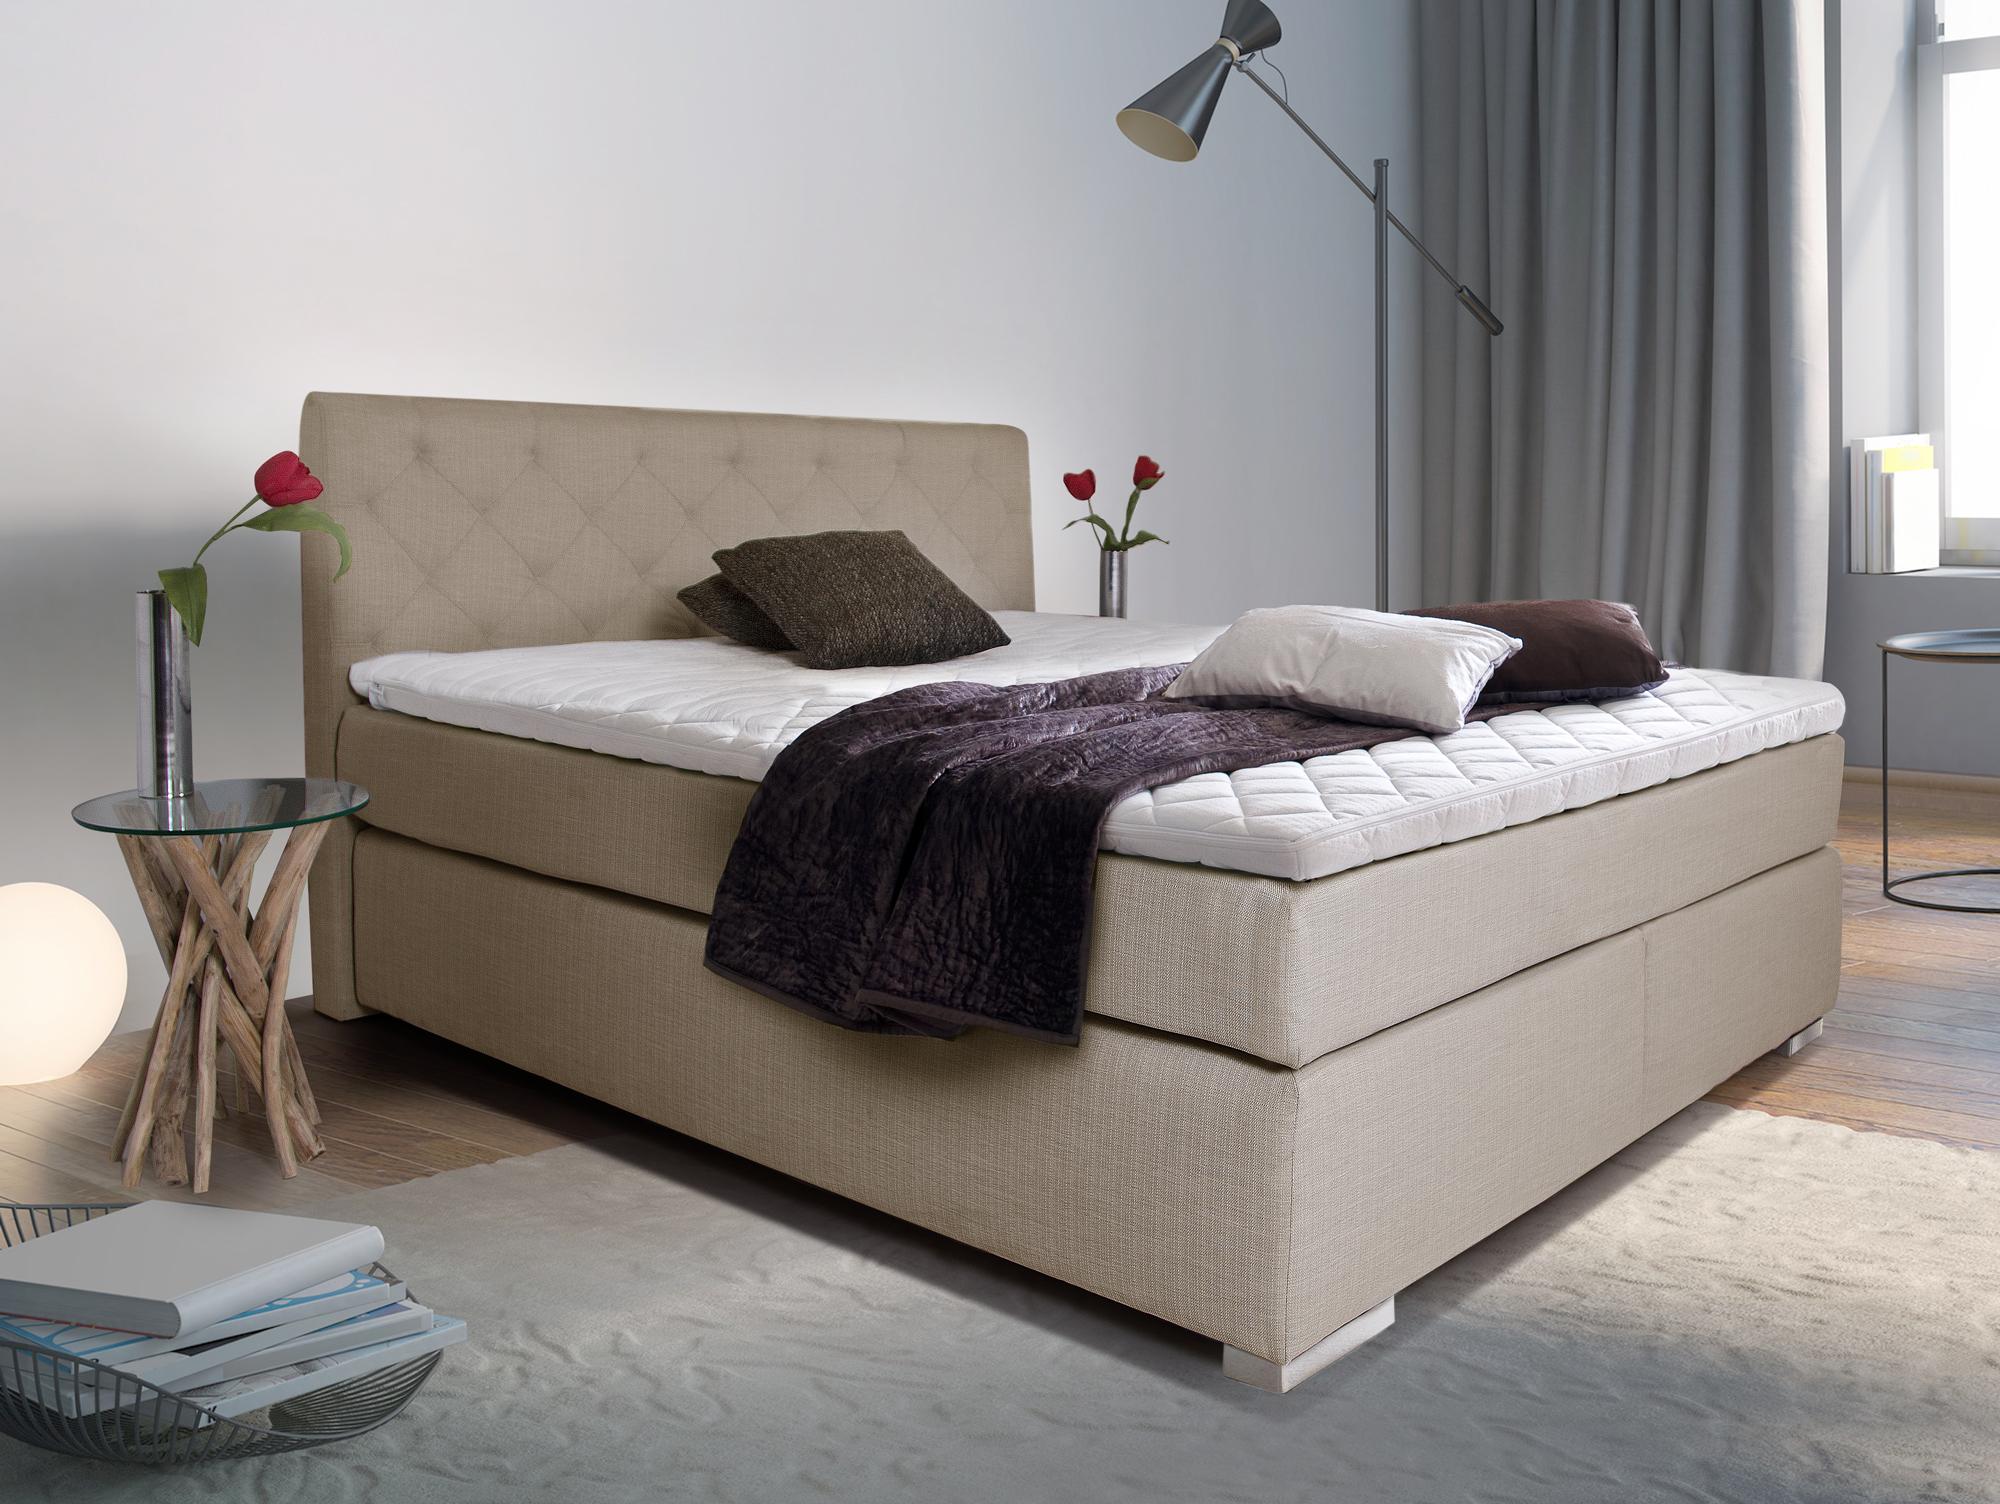 premium boxspringbett inkl kopfteil 180 x 200 cm beige h rtegrad 2. Black Bedroom Furniture Sets. Home Design Ideas